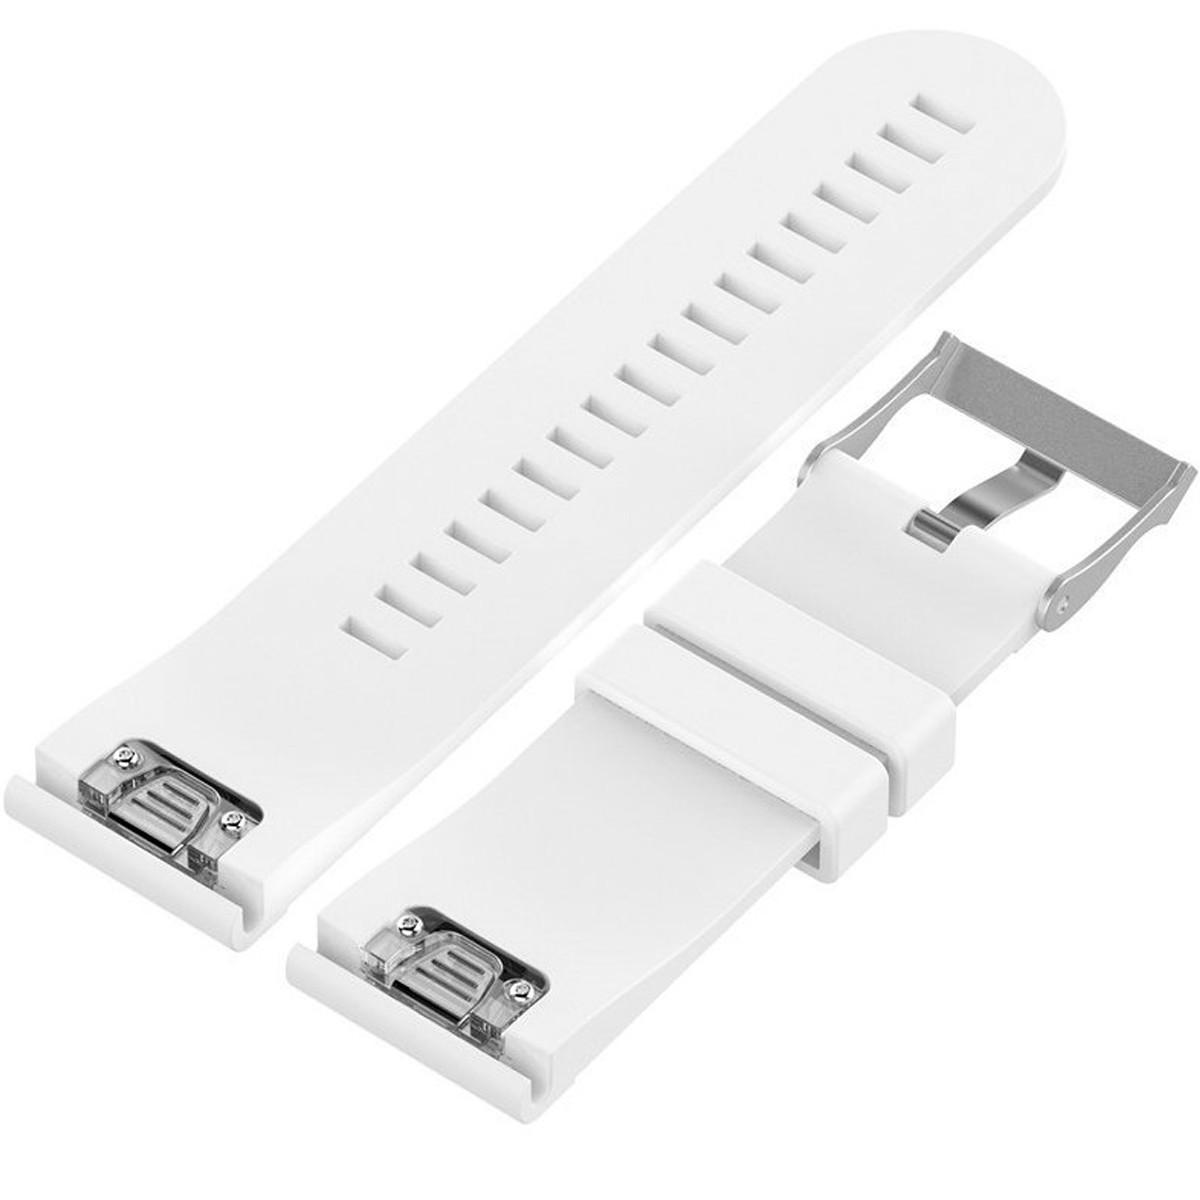 Curea ceas Smartwatch Garmin Fenix5, 22 mm Silicon iUni White